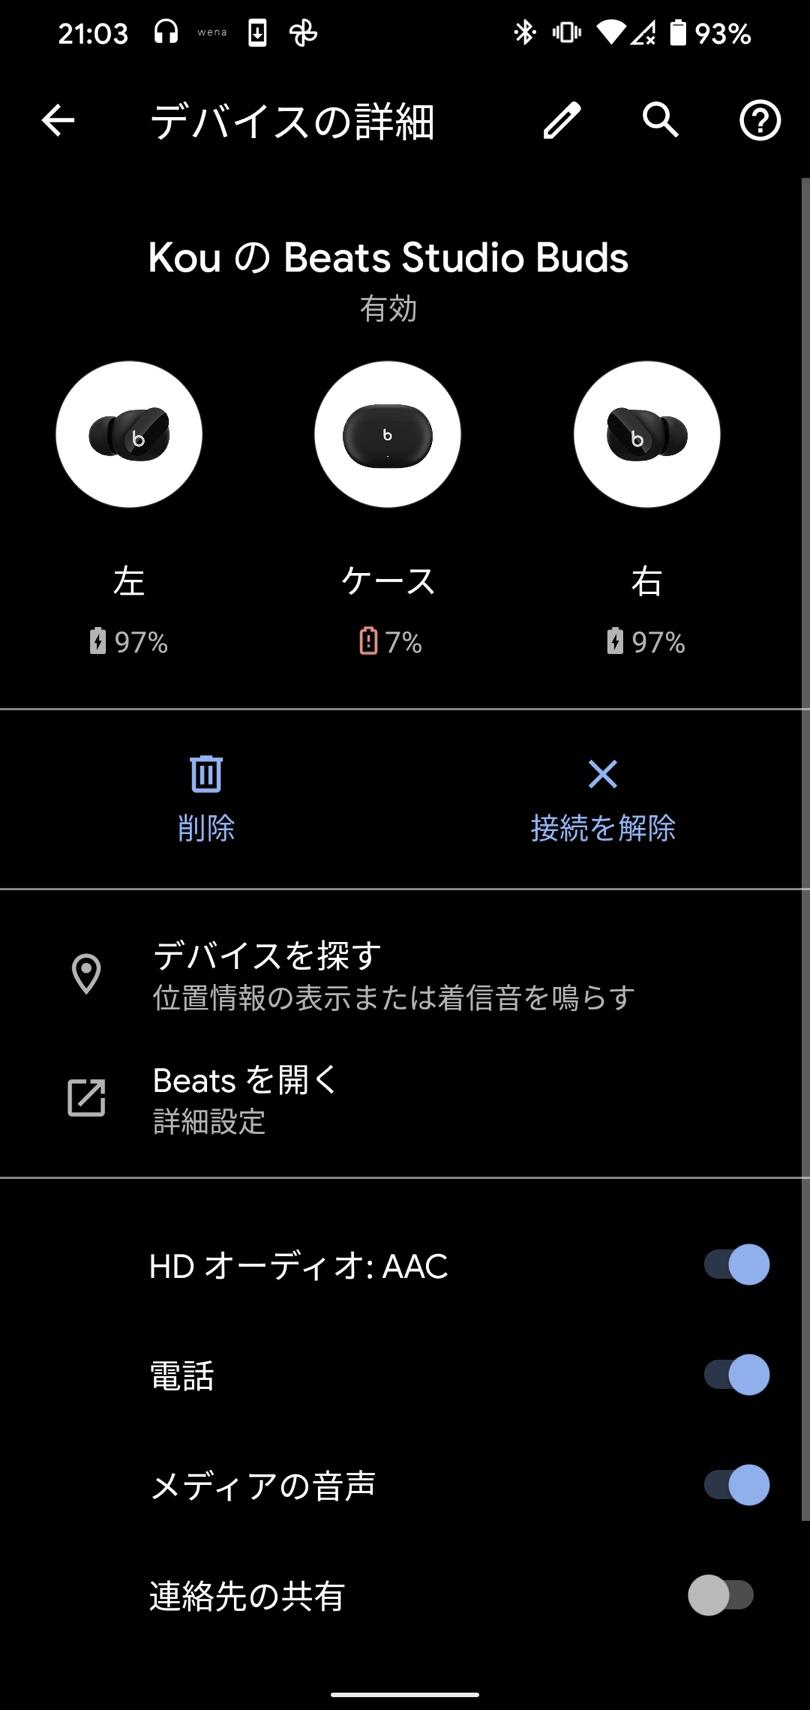 Beats Studio Buds 設定画面